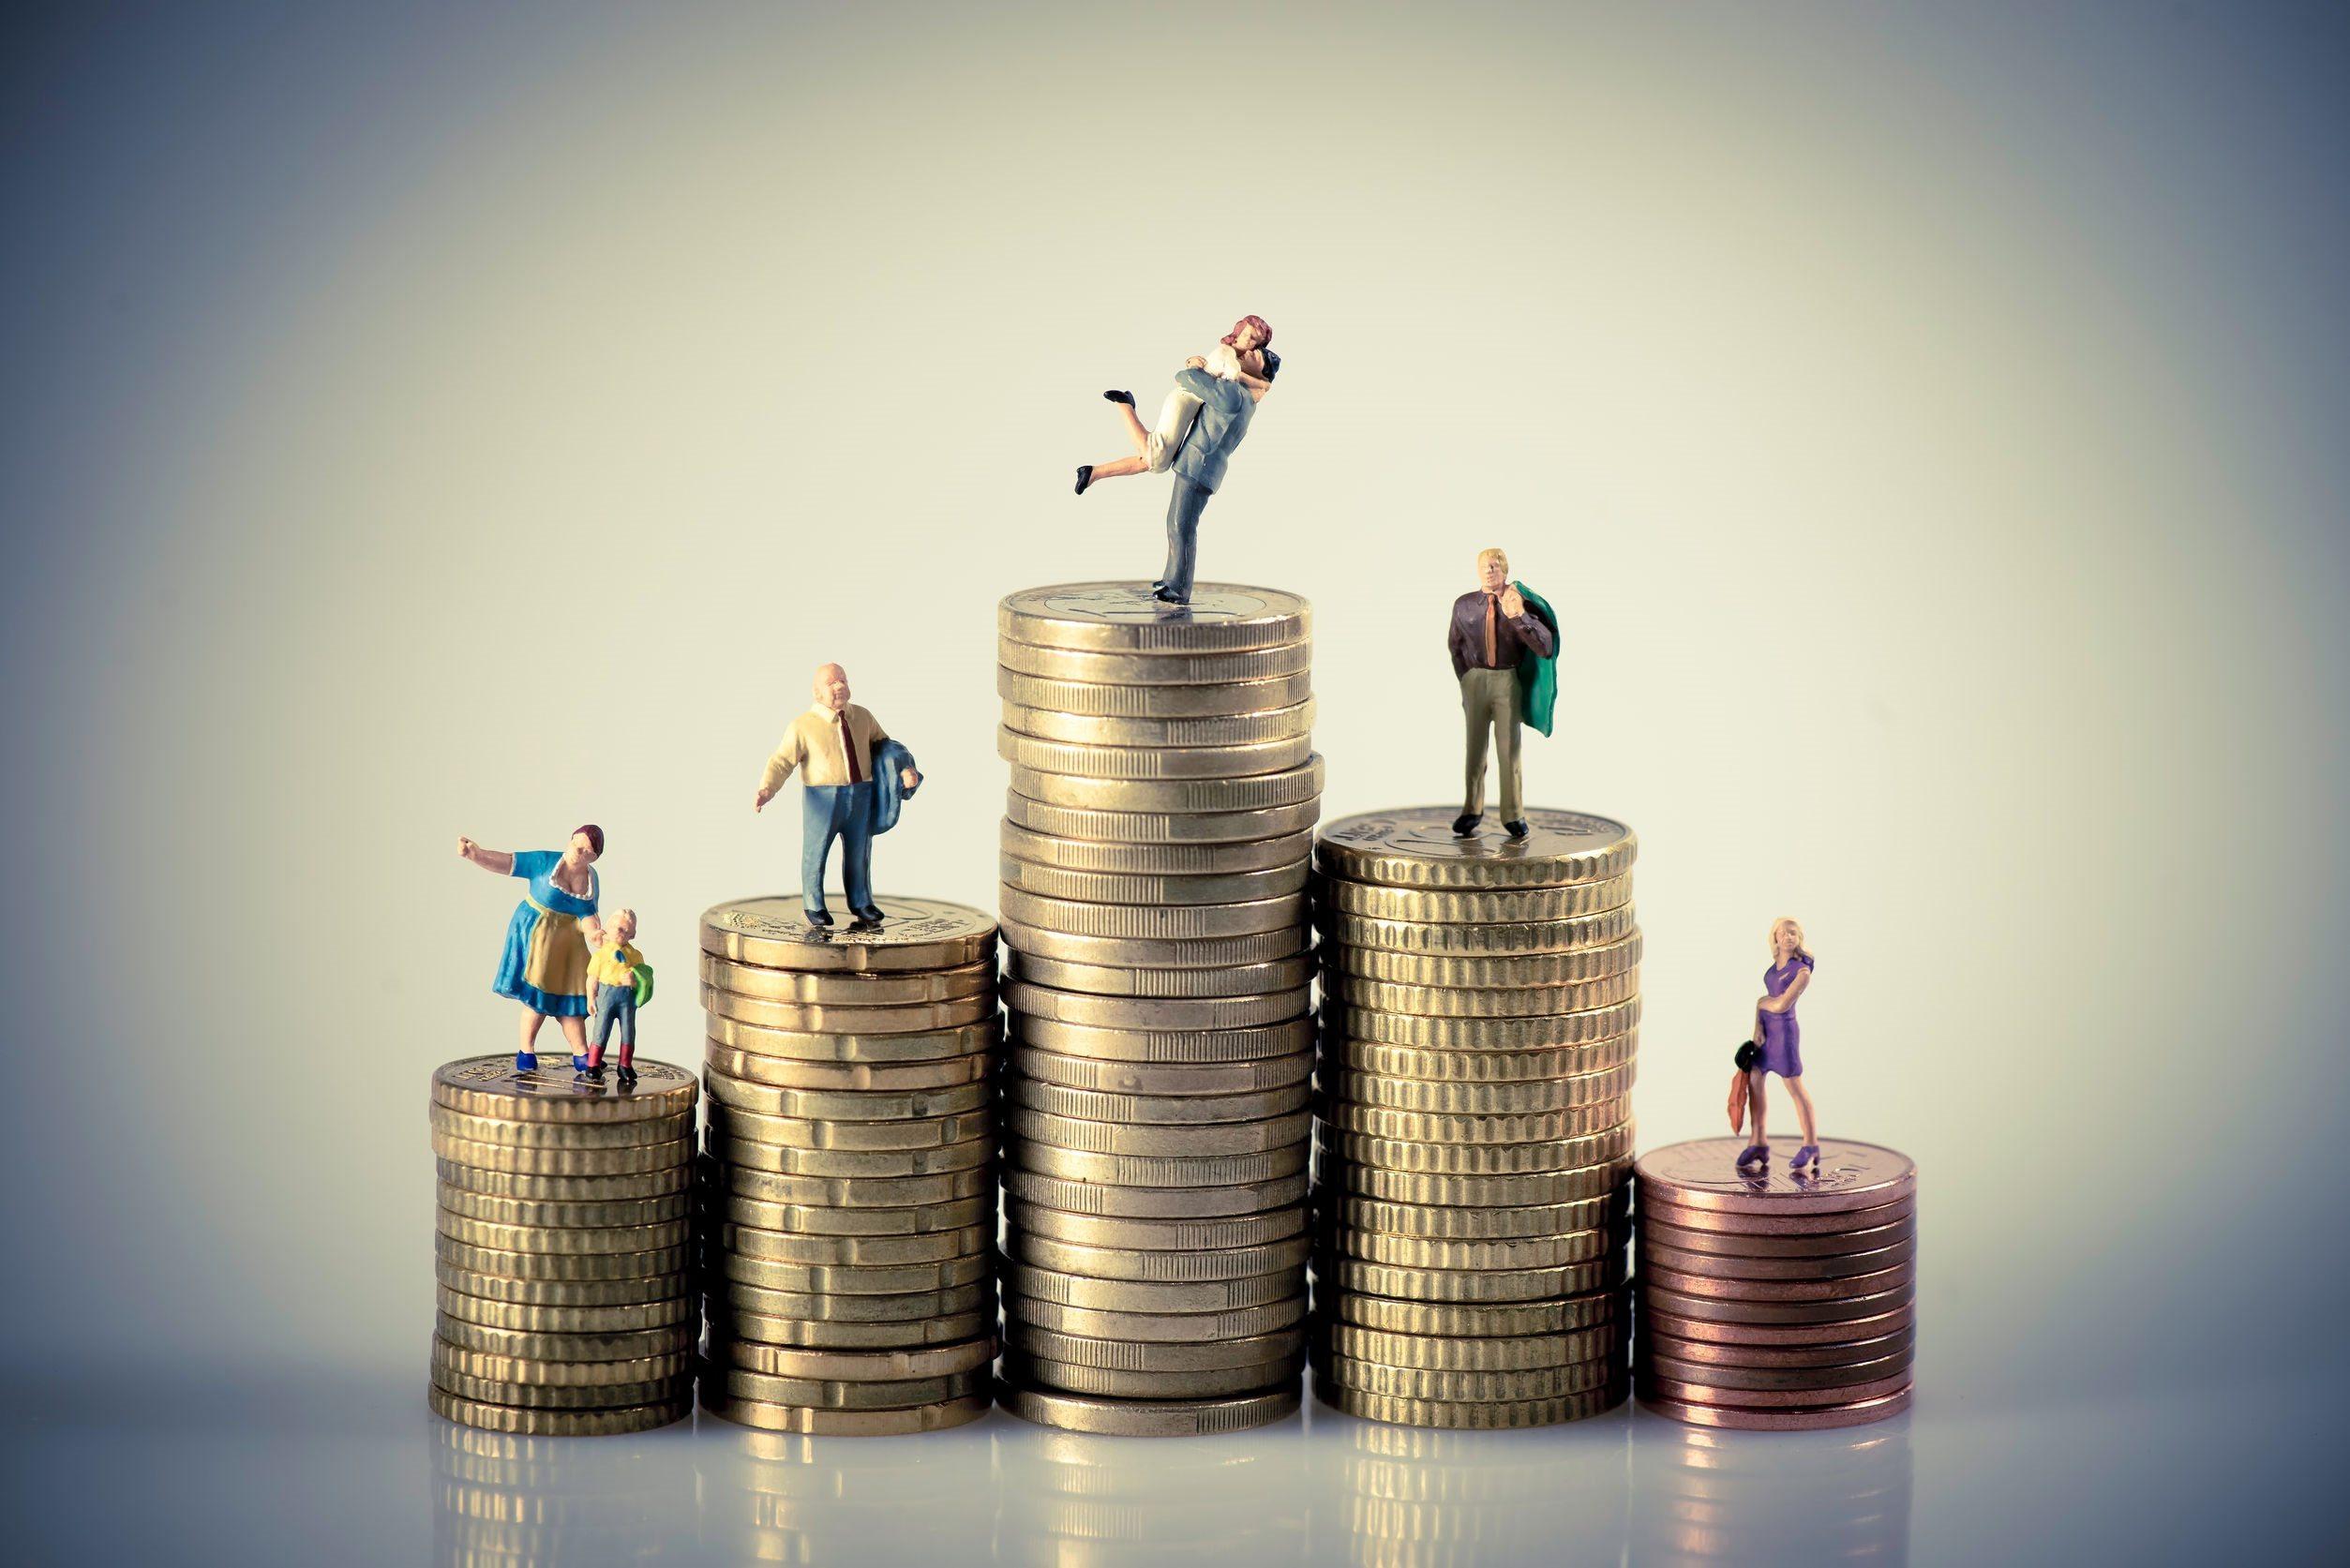 (Verslag NIMA Finance) 'Betere Financiële Dienstverlening door meer Kennis over Gedrag'